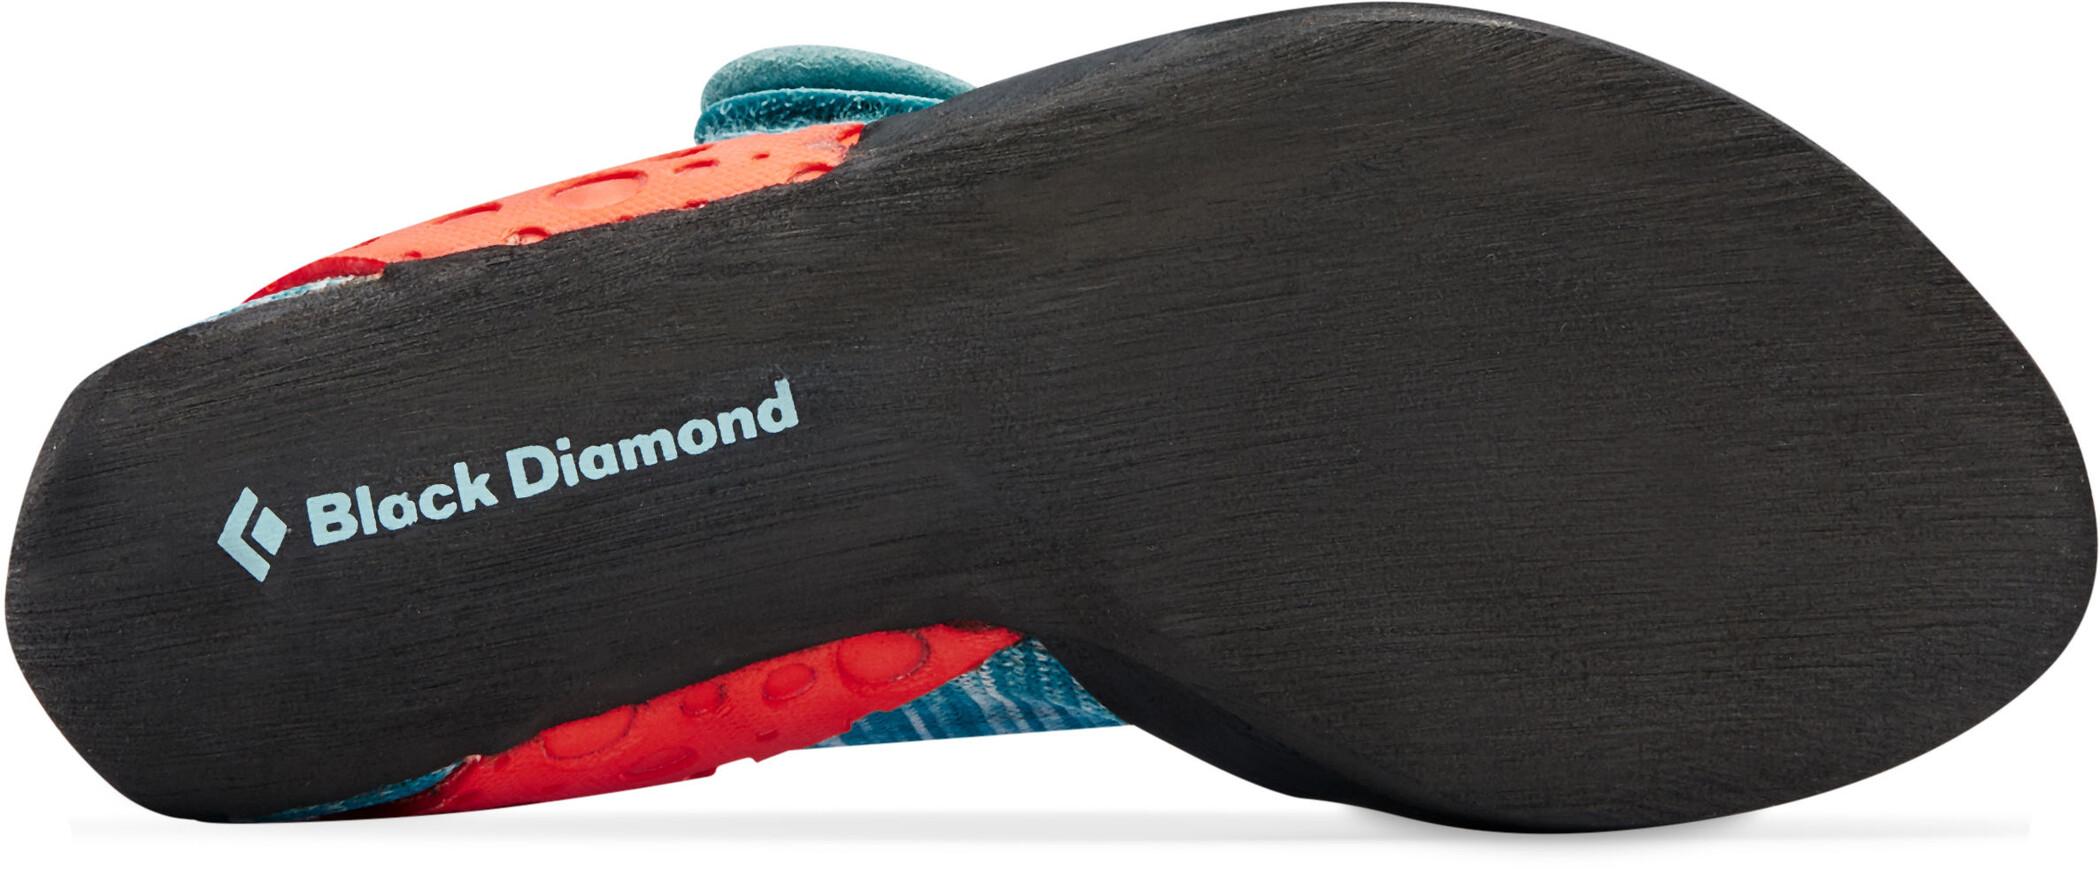 Black Diamond Momentum Climbing Shoes Barn caspian